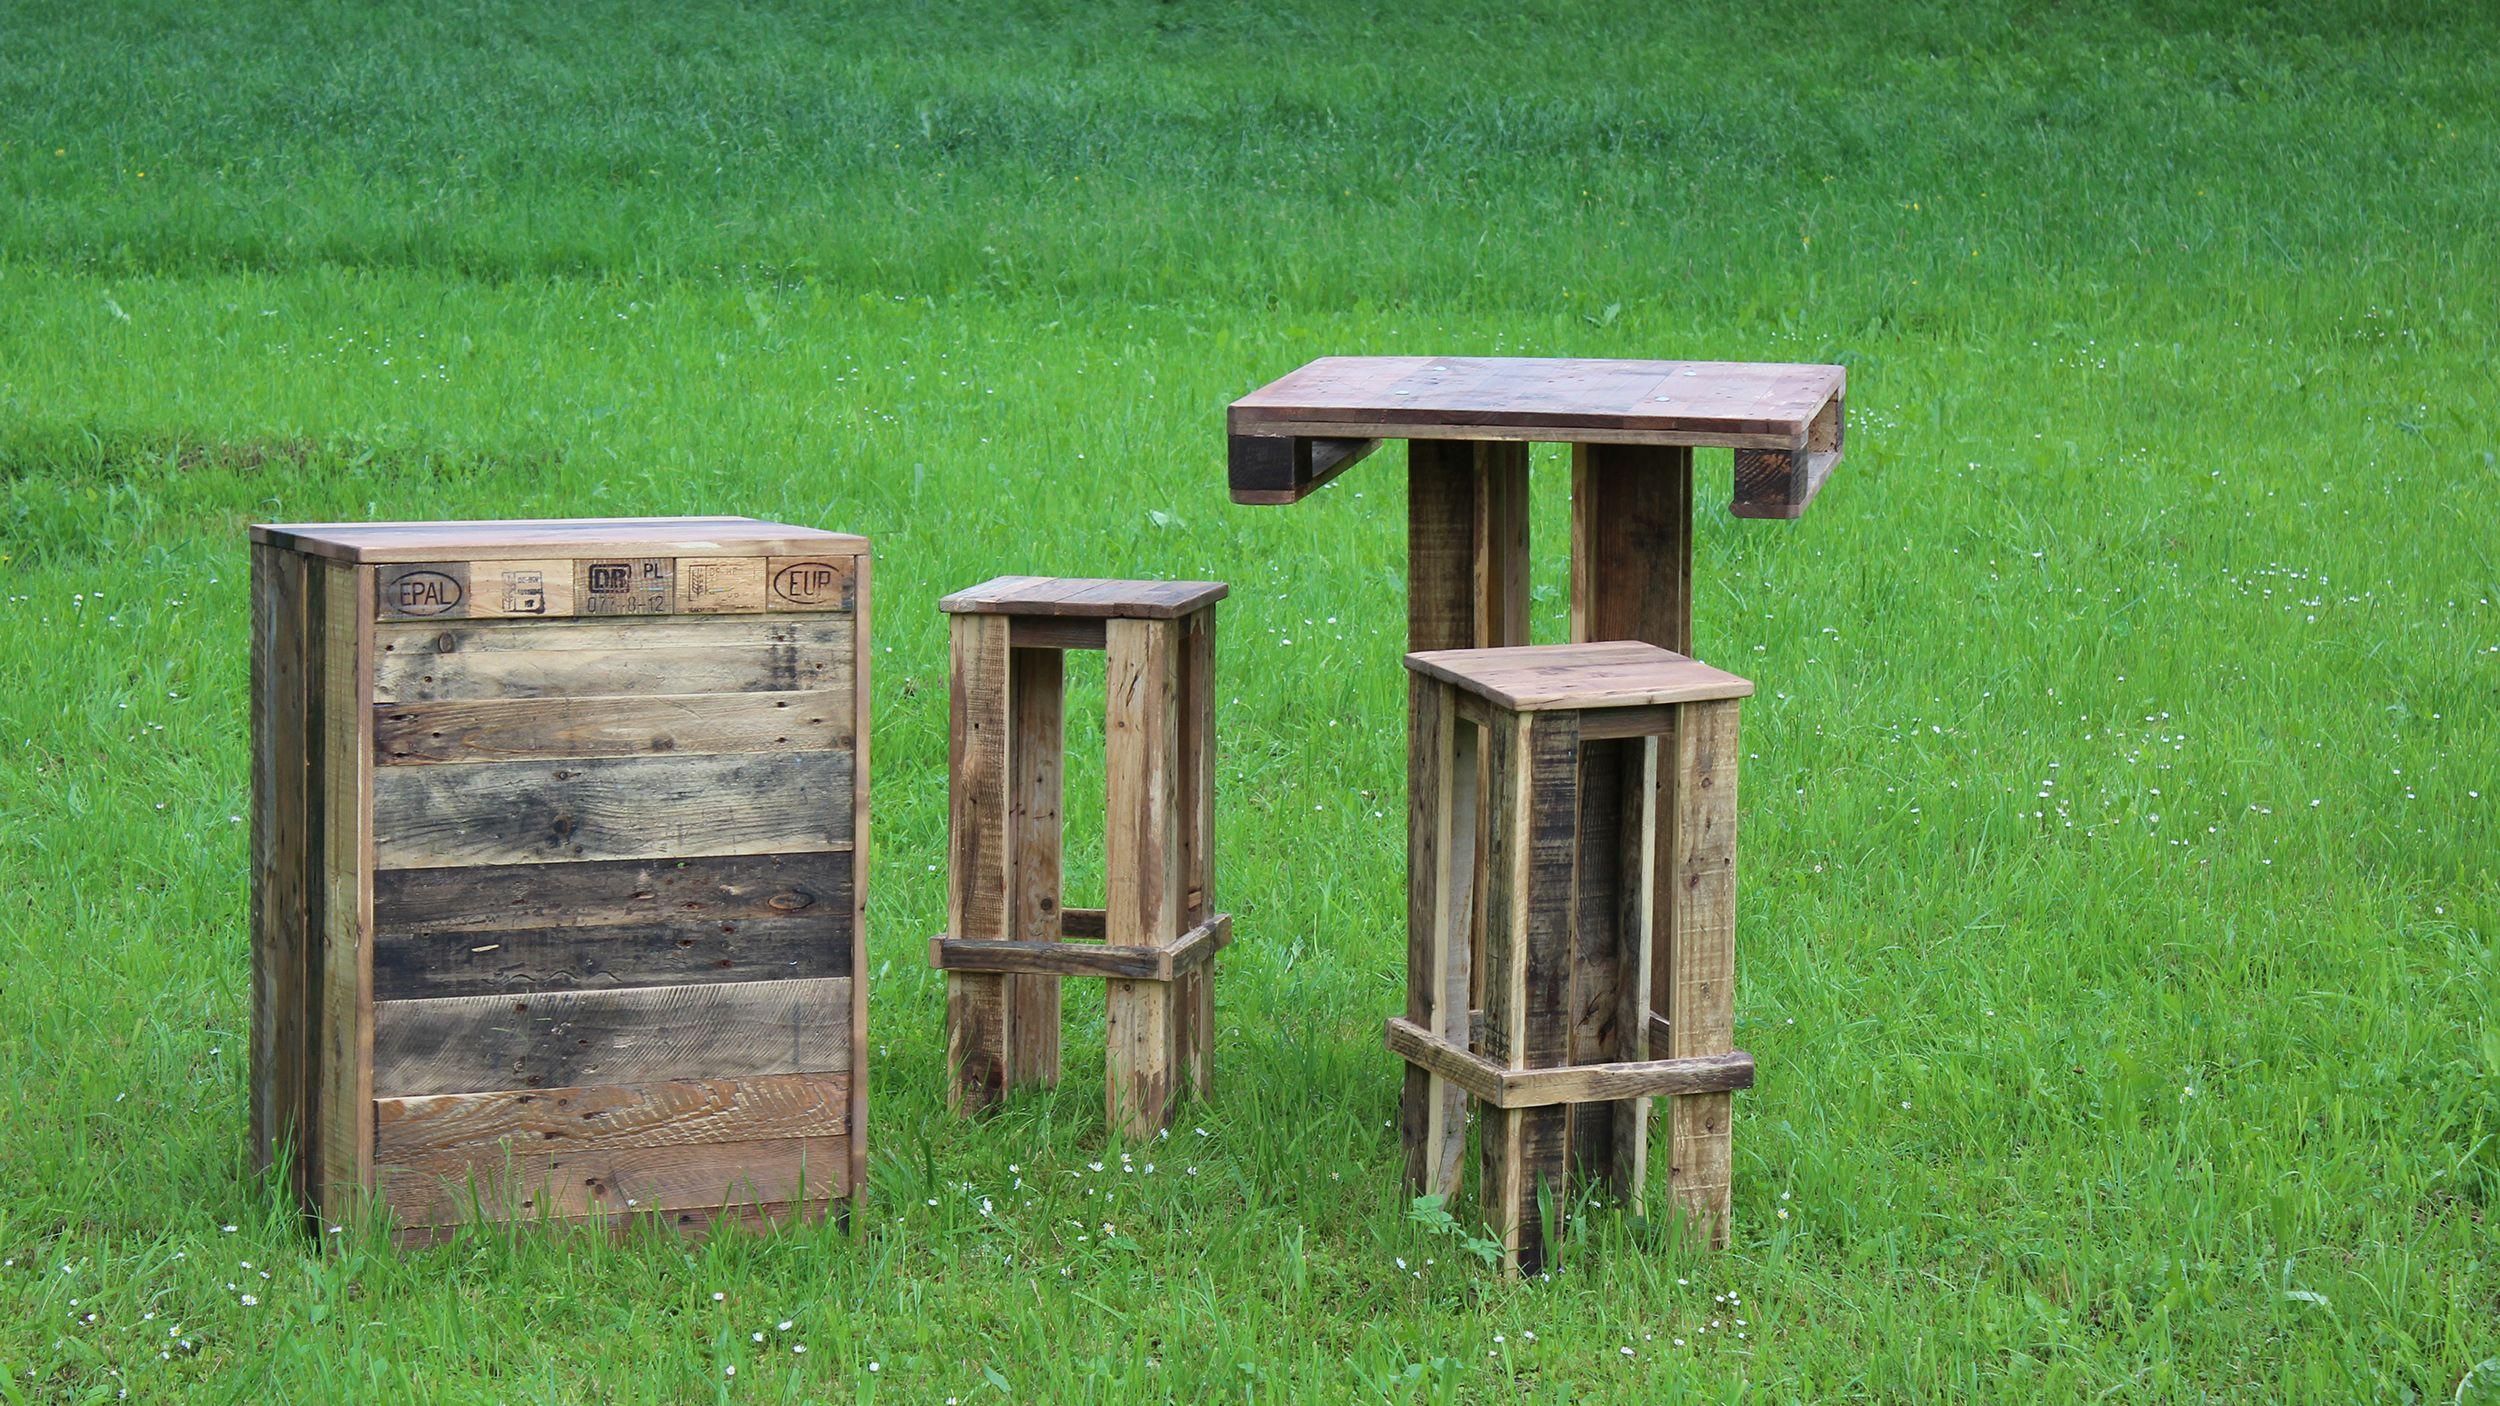 upcycling ideen aus alt mach neu naturenergieplus. Black Bedroom Furniture Sets. Home Design Ideas